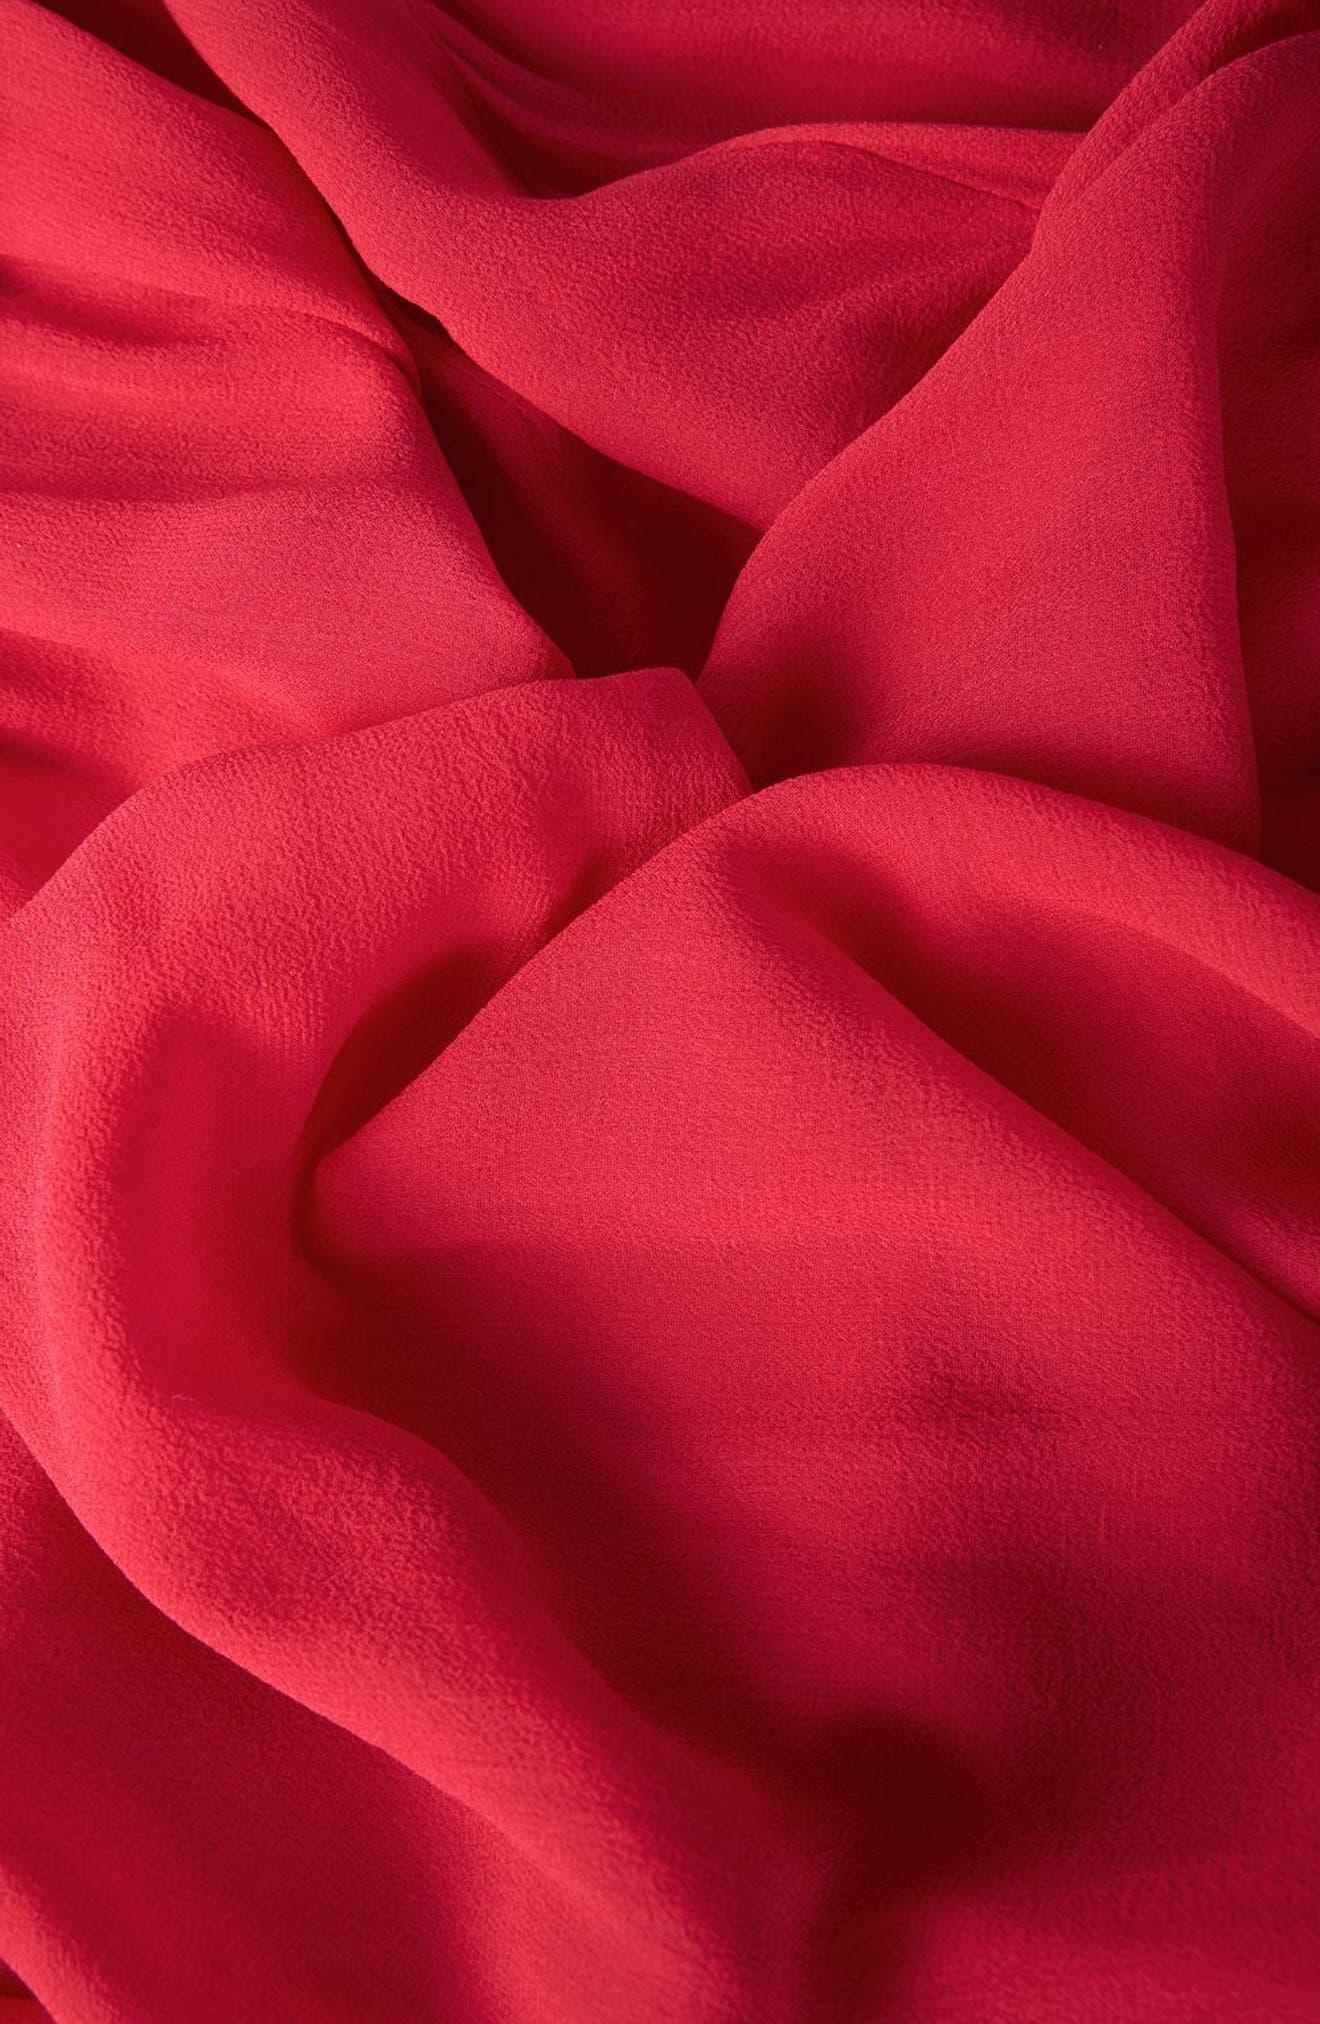 Pleat Neck Blouse,                             Alternate thumbnail 5, color,                             Red